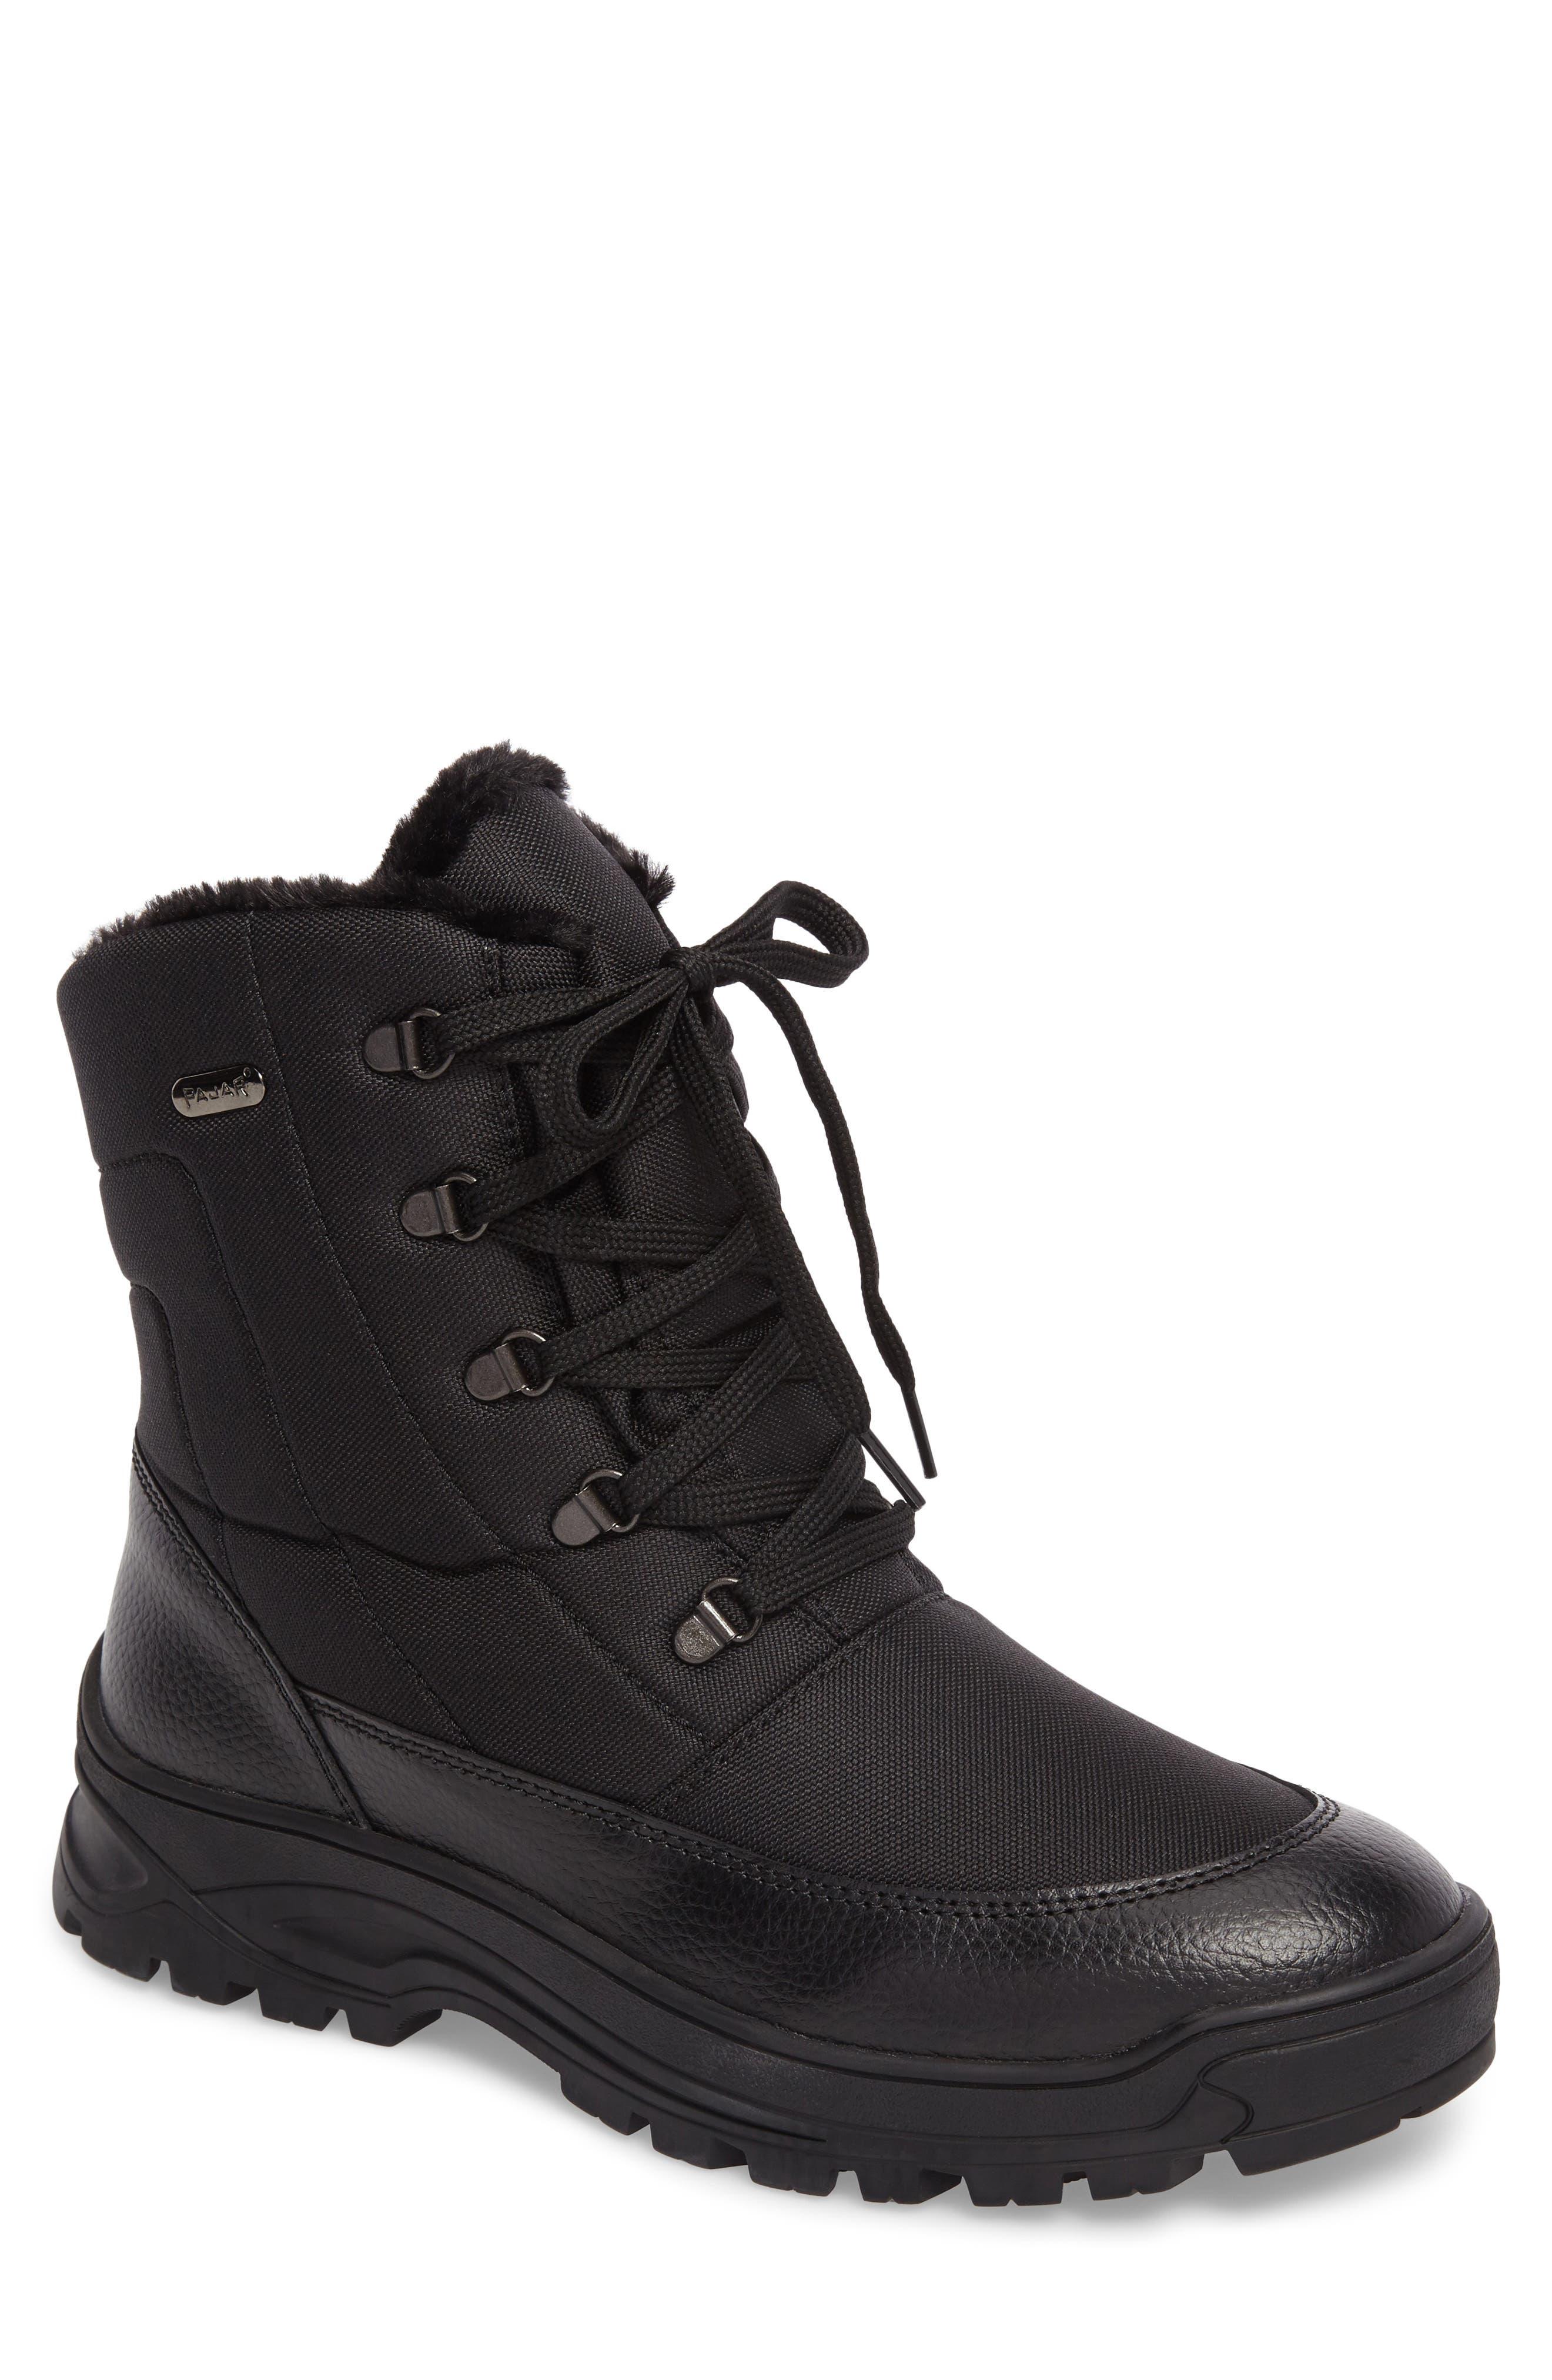 Trigger Winter Waterproof Boot,                         Main,                         color, BLACK